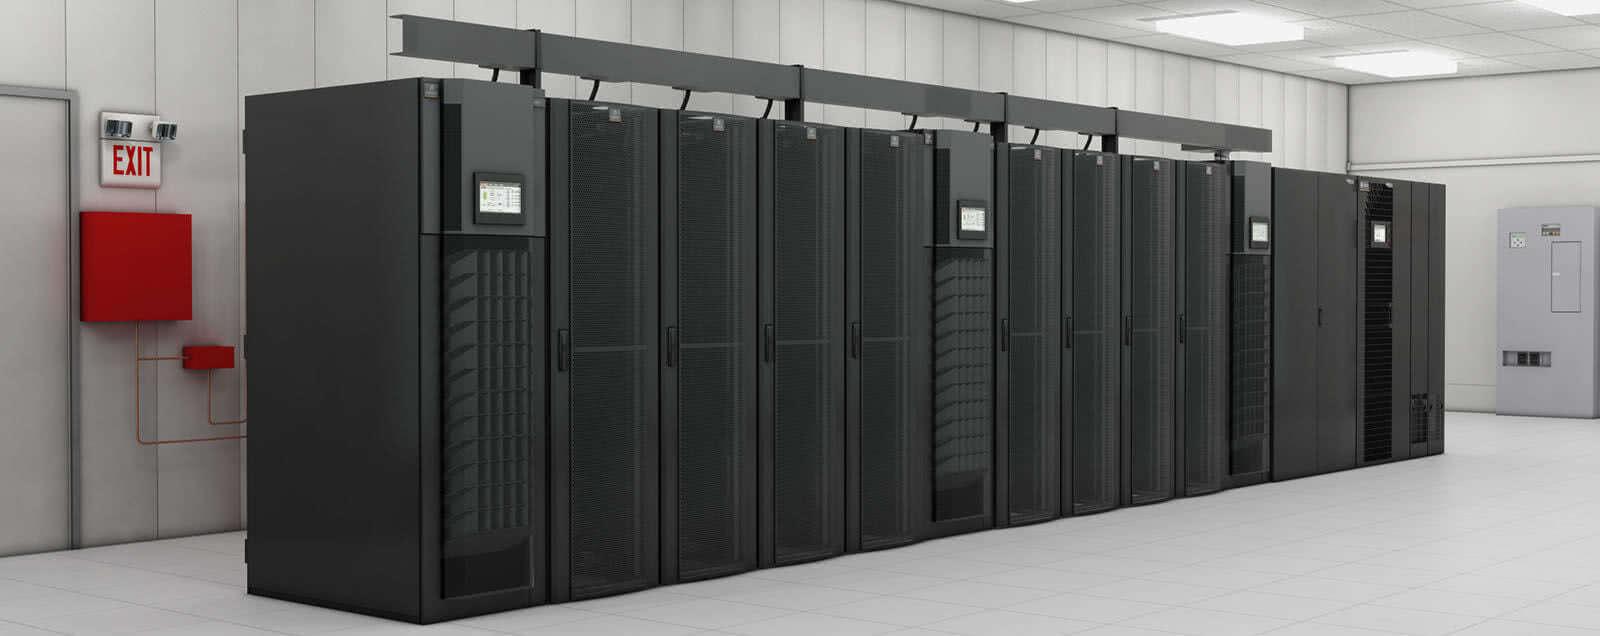 Liebert Data Center Systems Vertiv Thermal Amp Power Systems